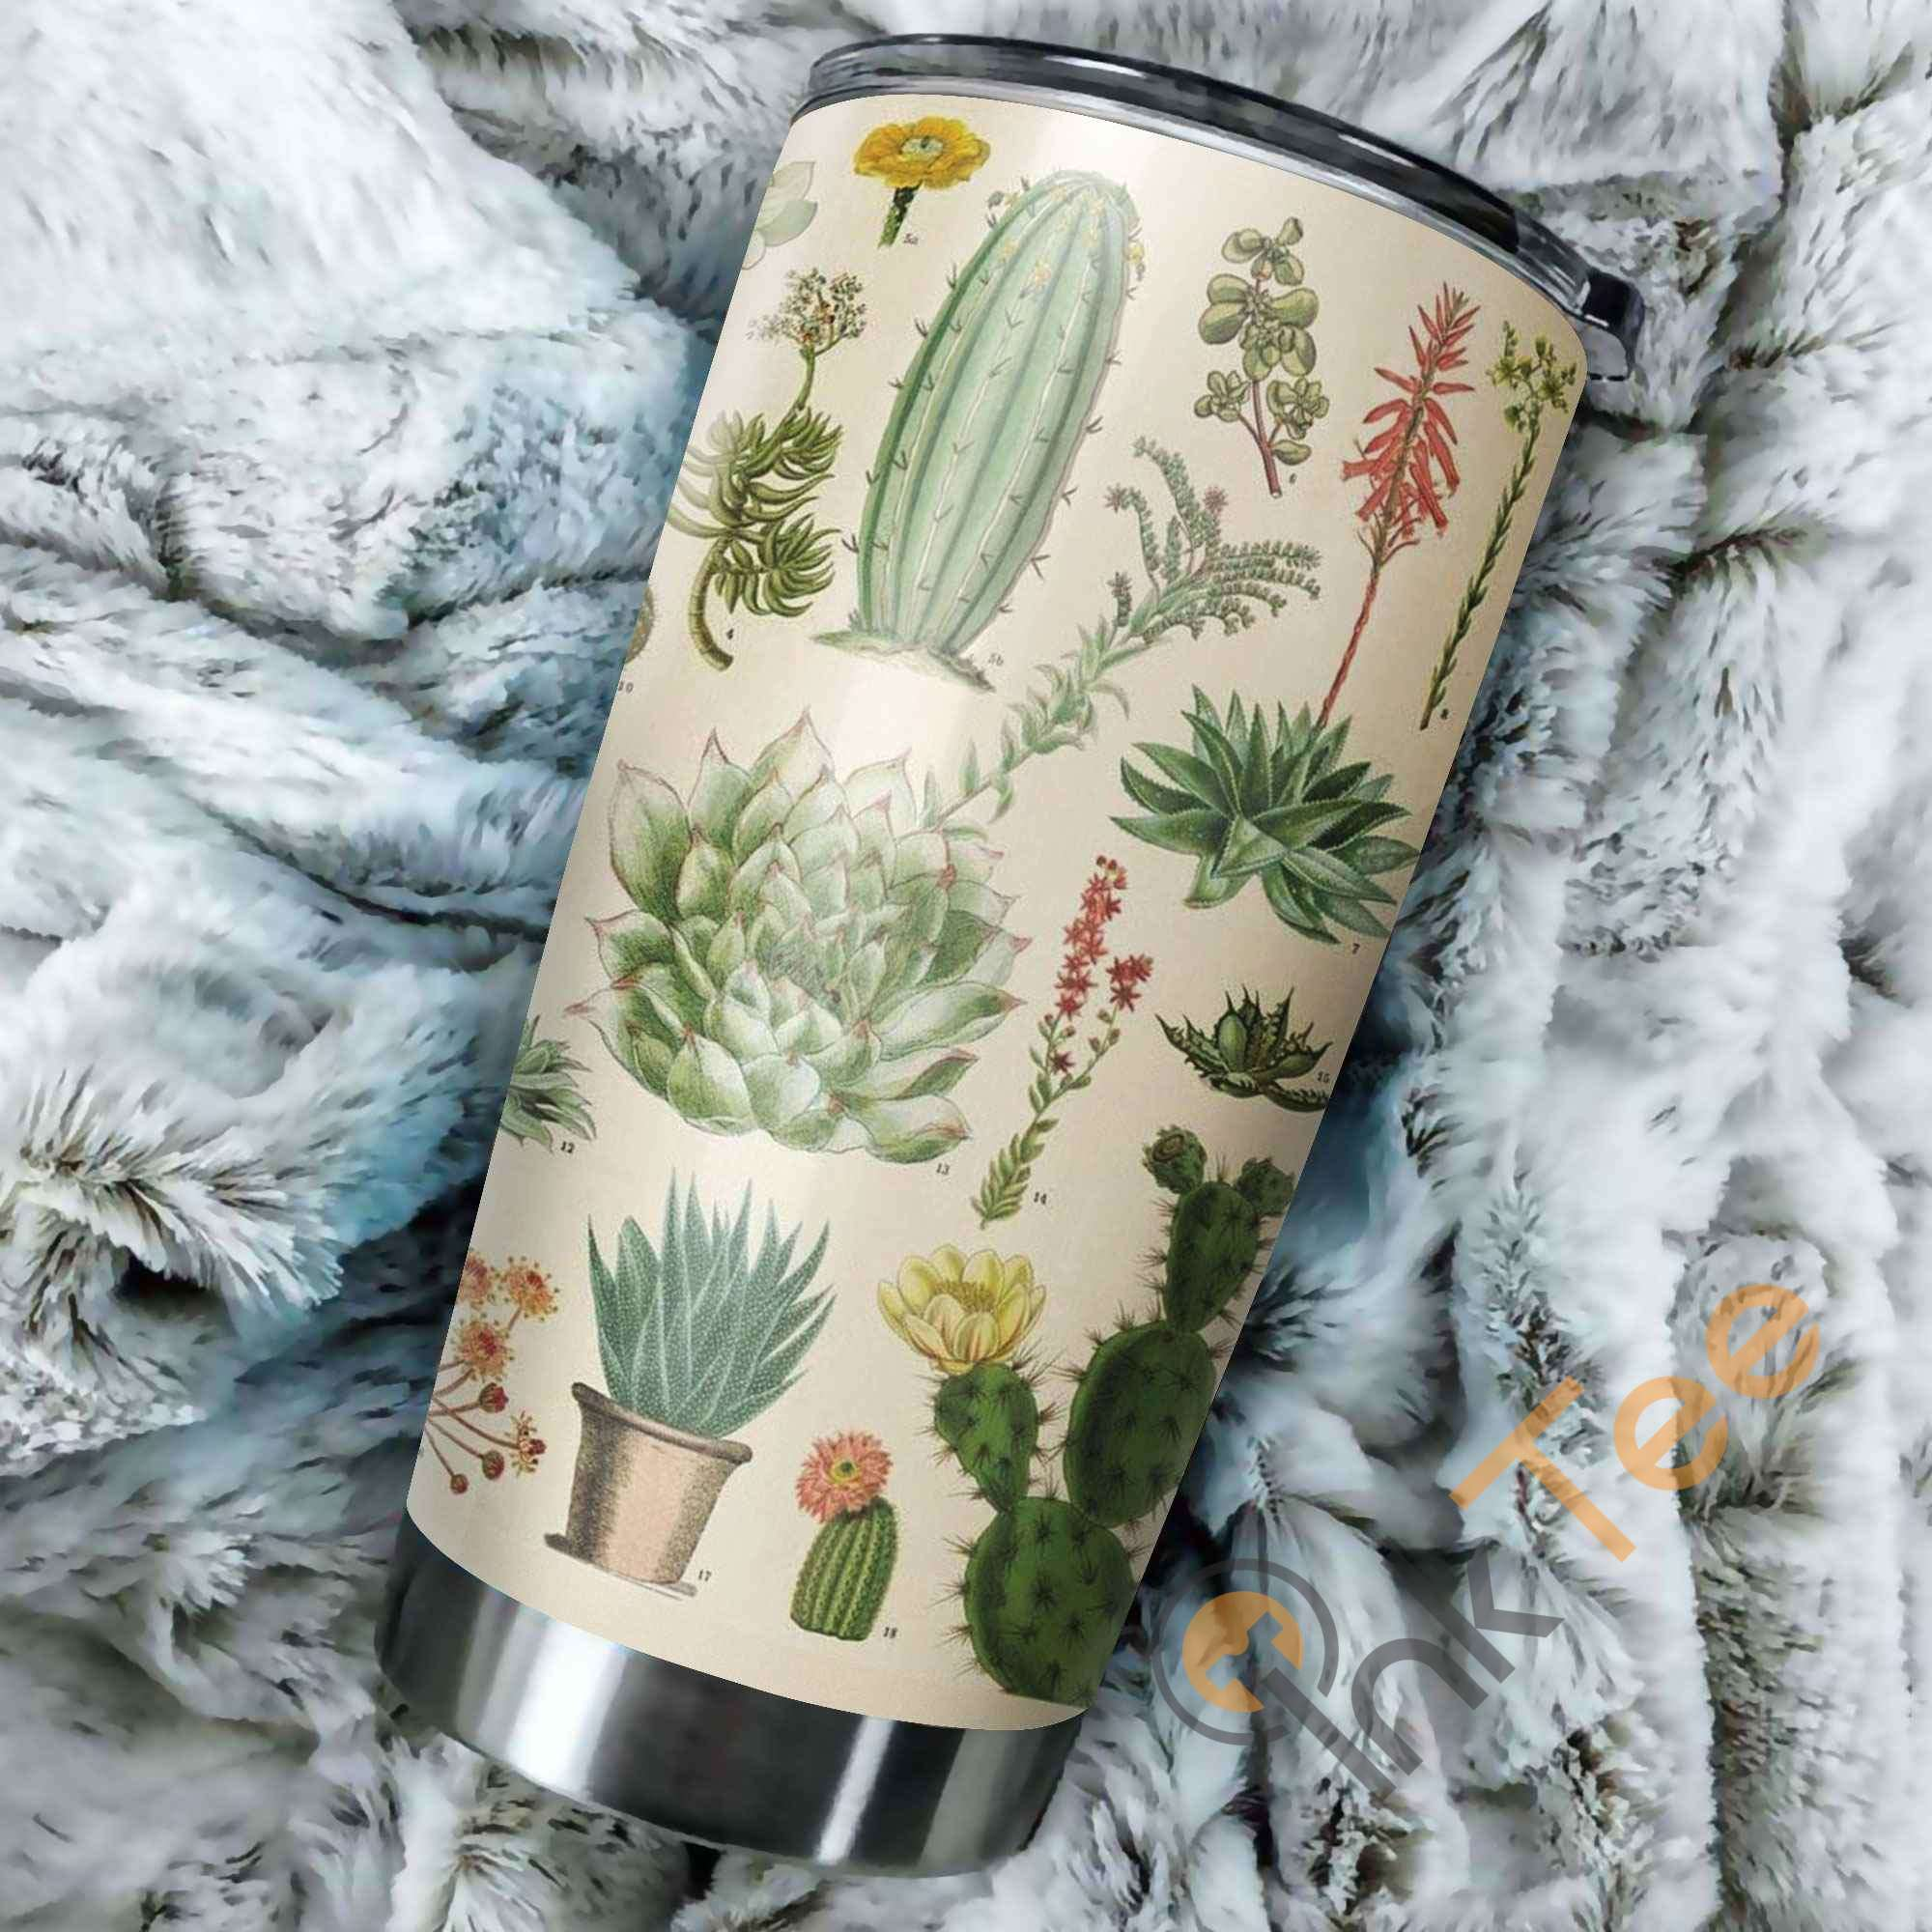 Love Cactus Amazon Best Seller Sku 3857 Stainless Steel Tumbler